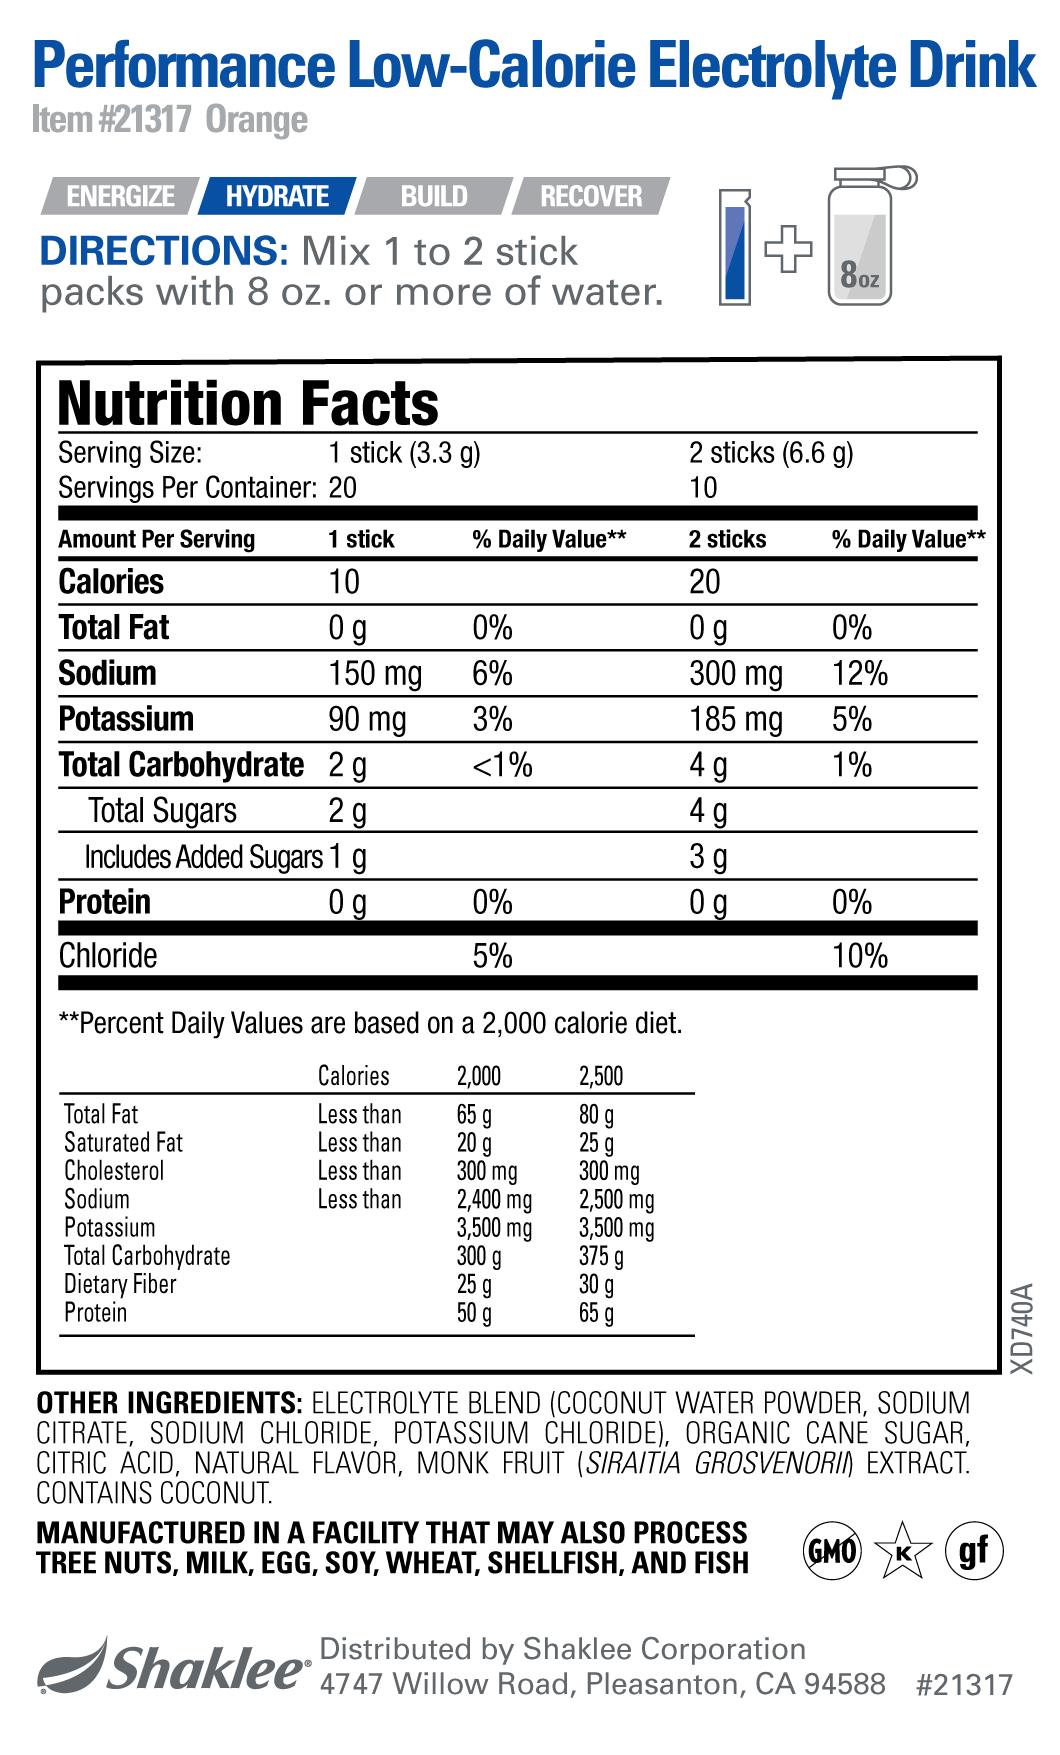 Performance Low-Calorie Electrolyte Drink ORANGE